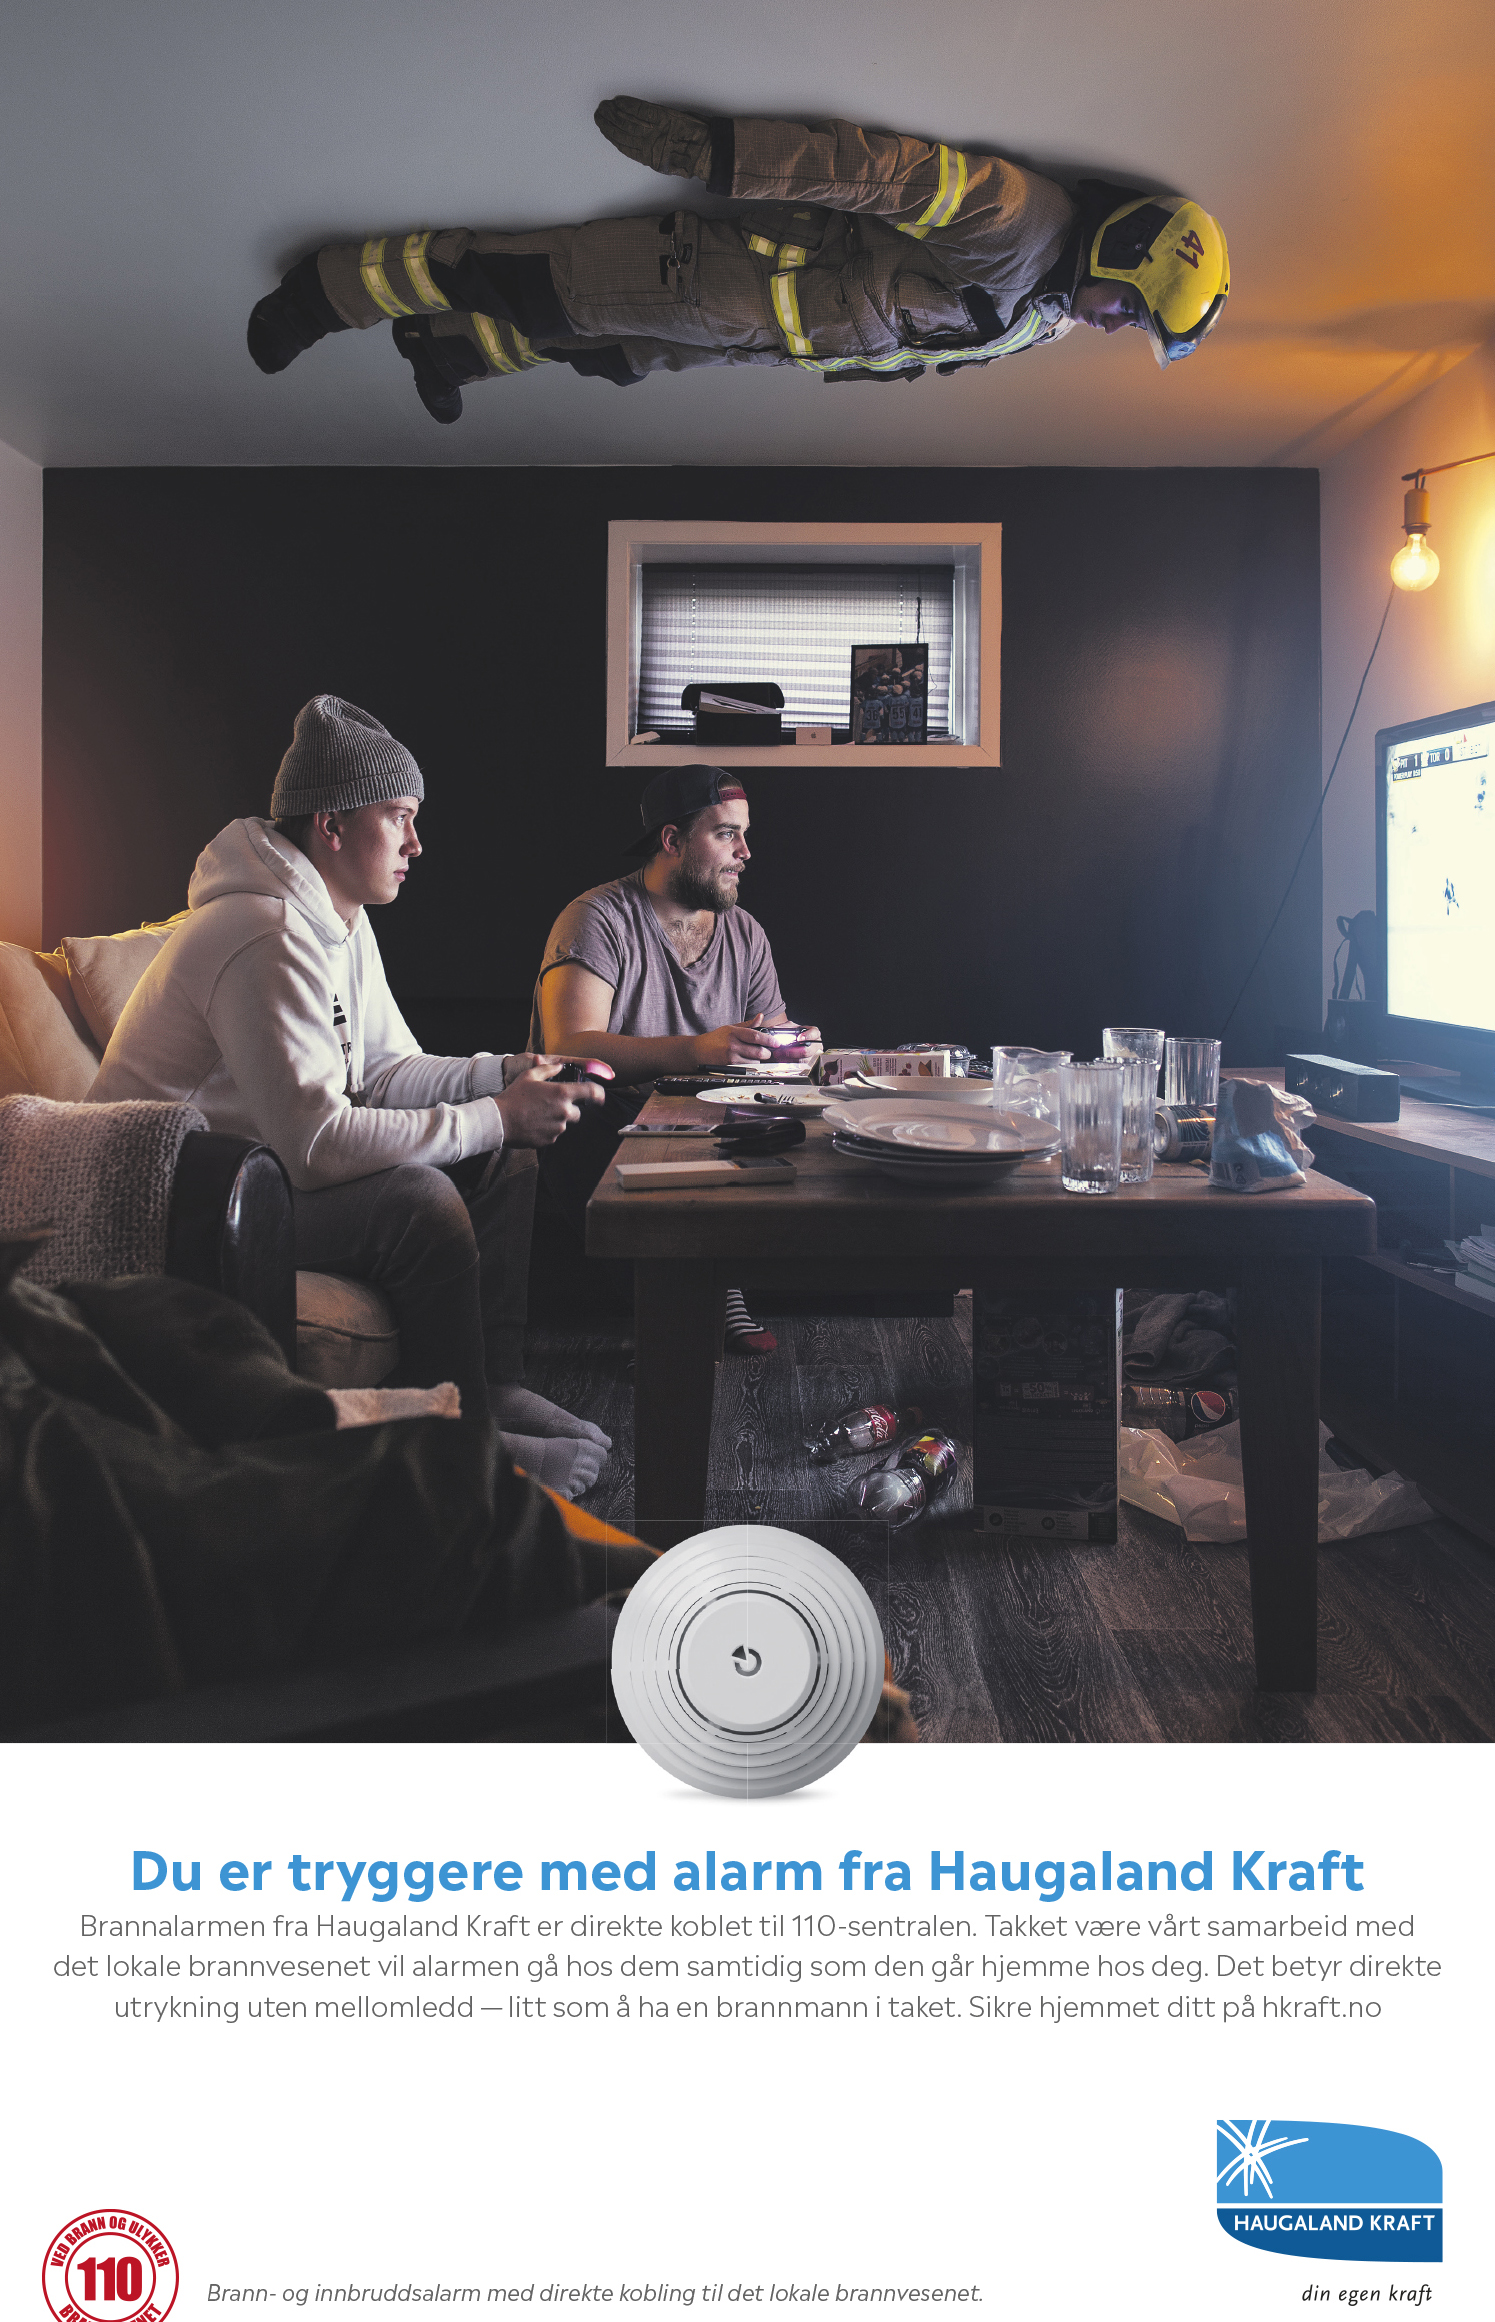 HaugalandKraft_Alarm_Helside_246x365_Trykk 3.jpg